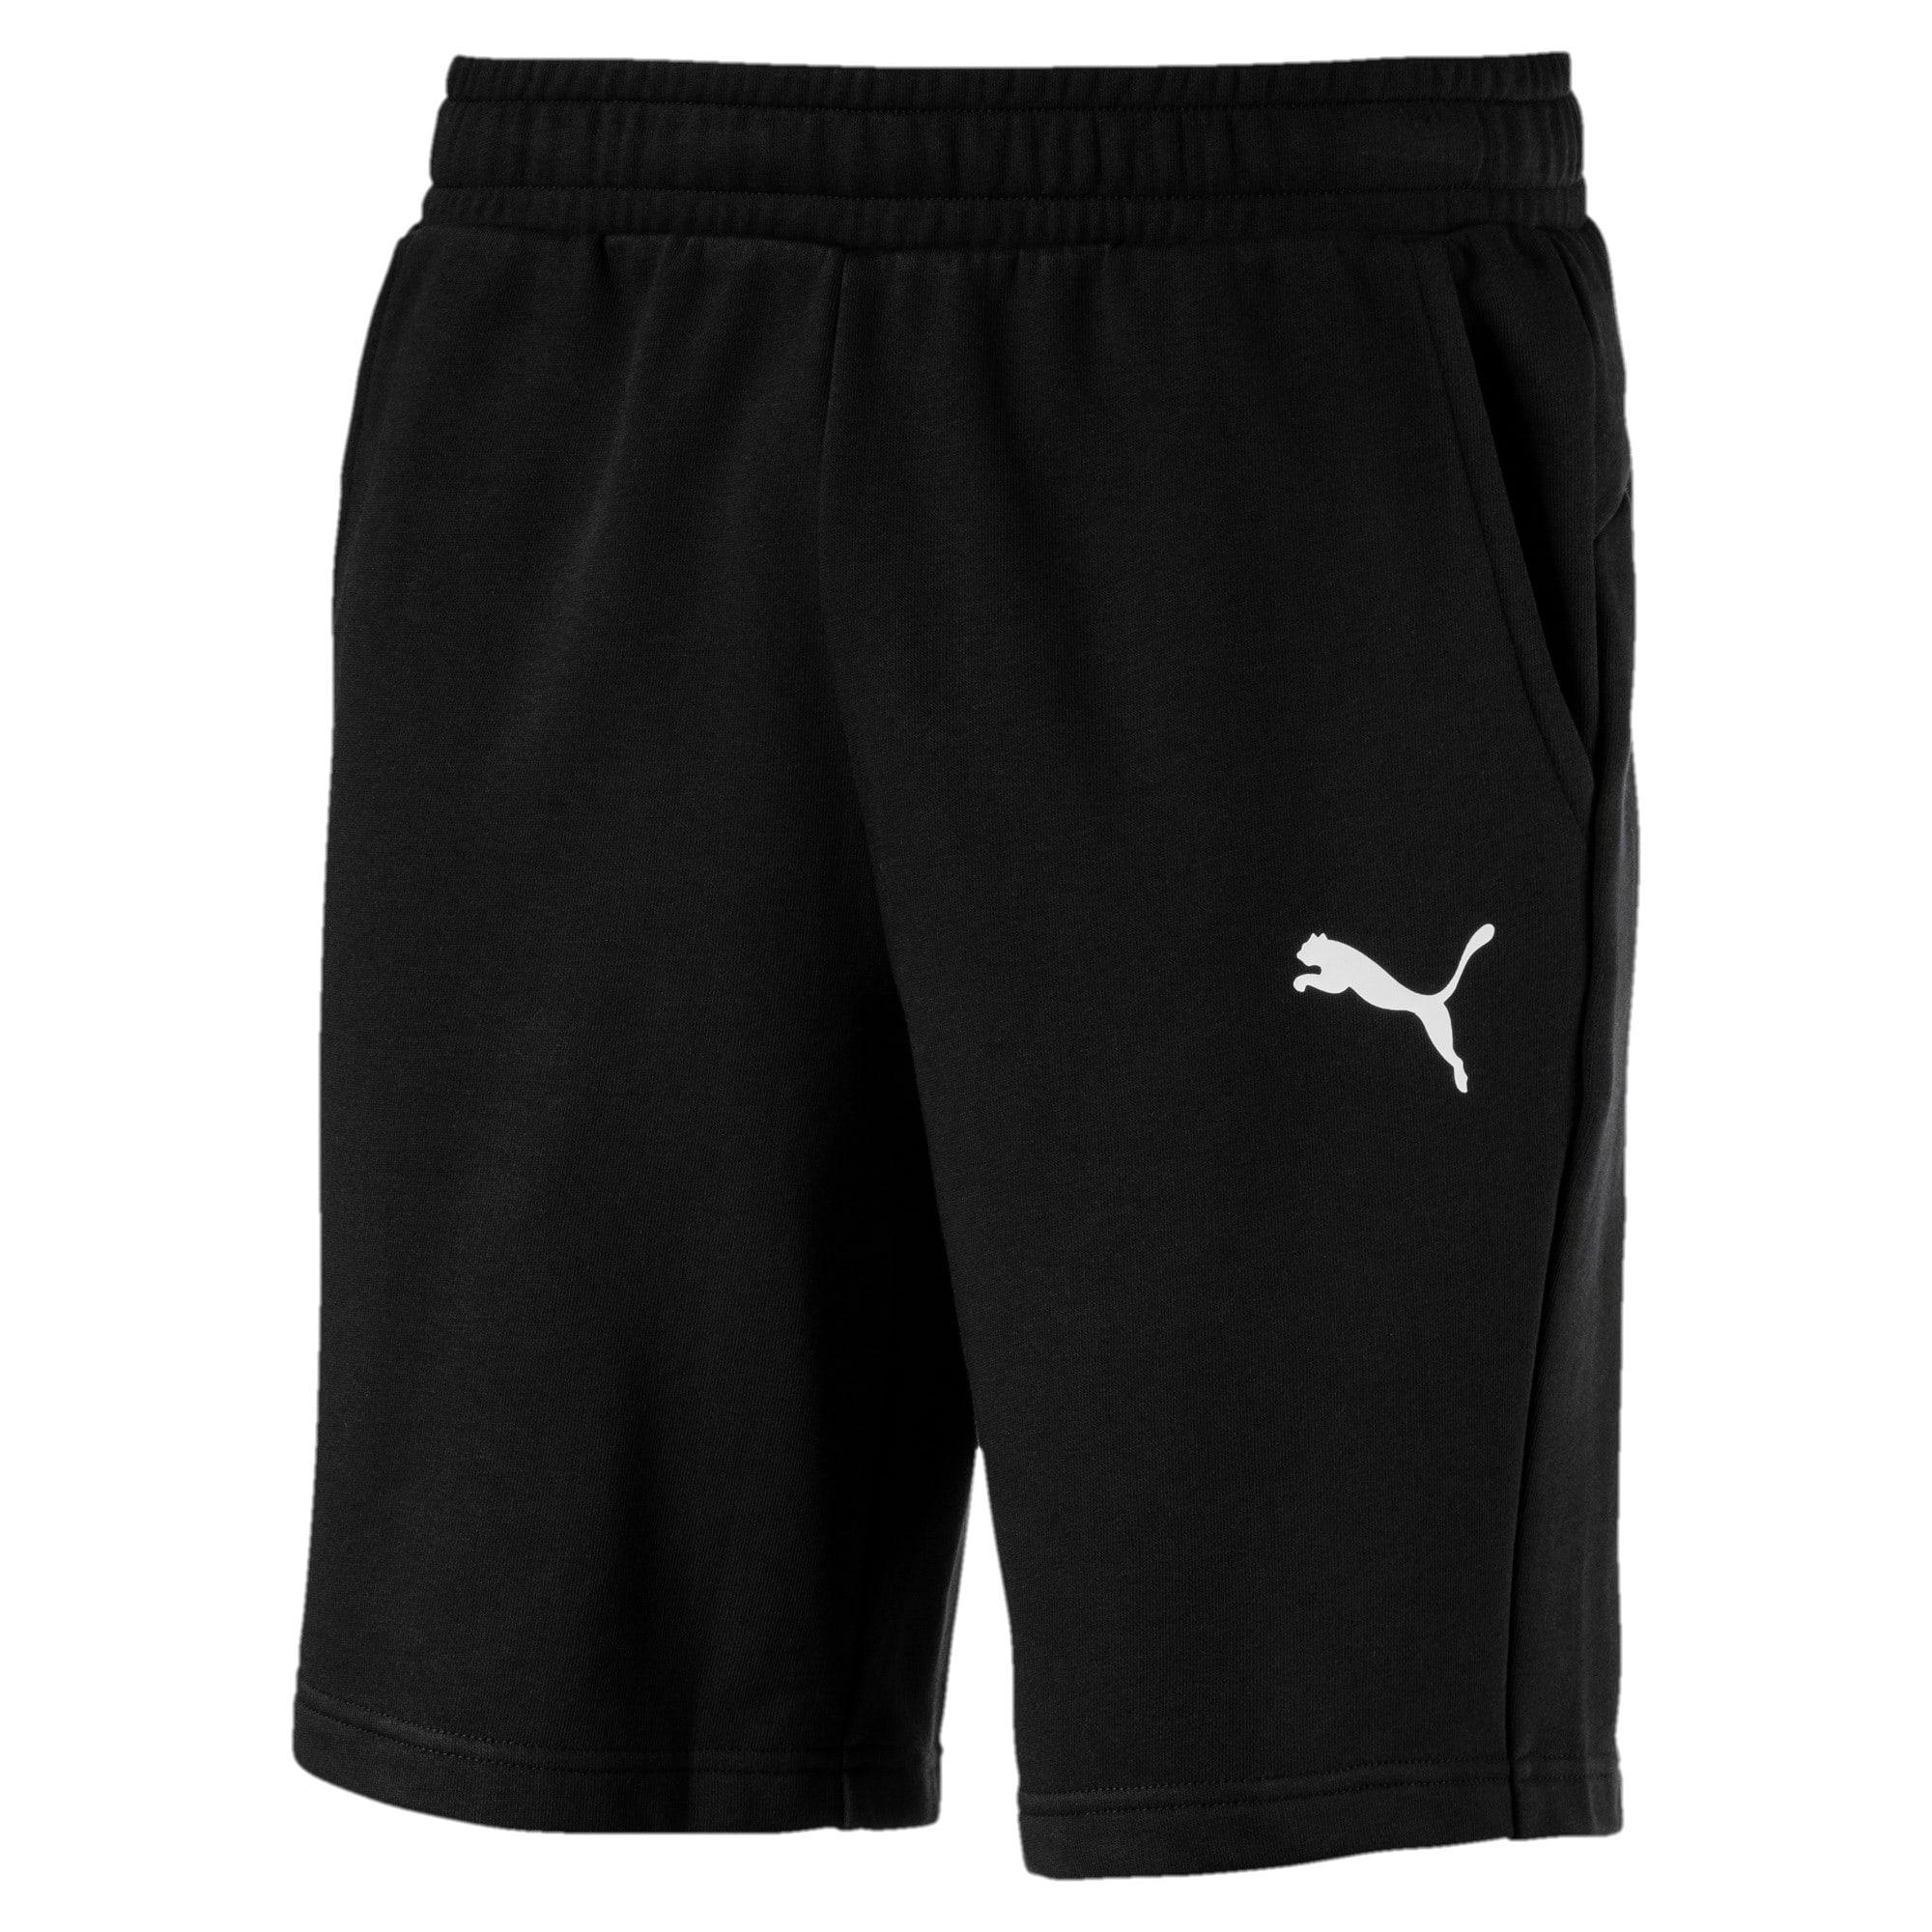 Miniatura 1 de Shorts deportivos Essentials para hombre, Puma Black-Cat, mediano